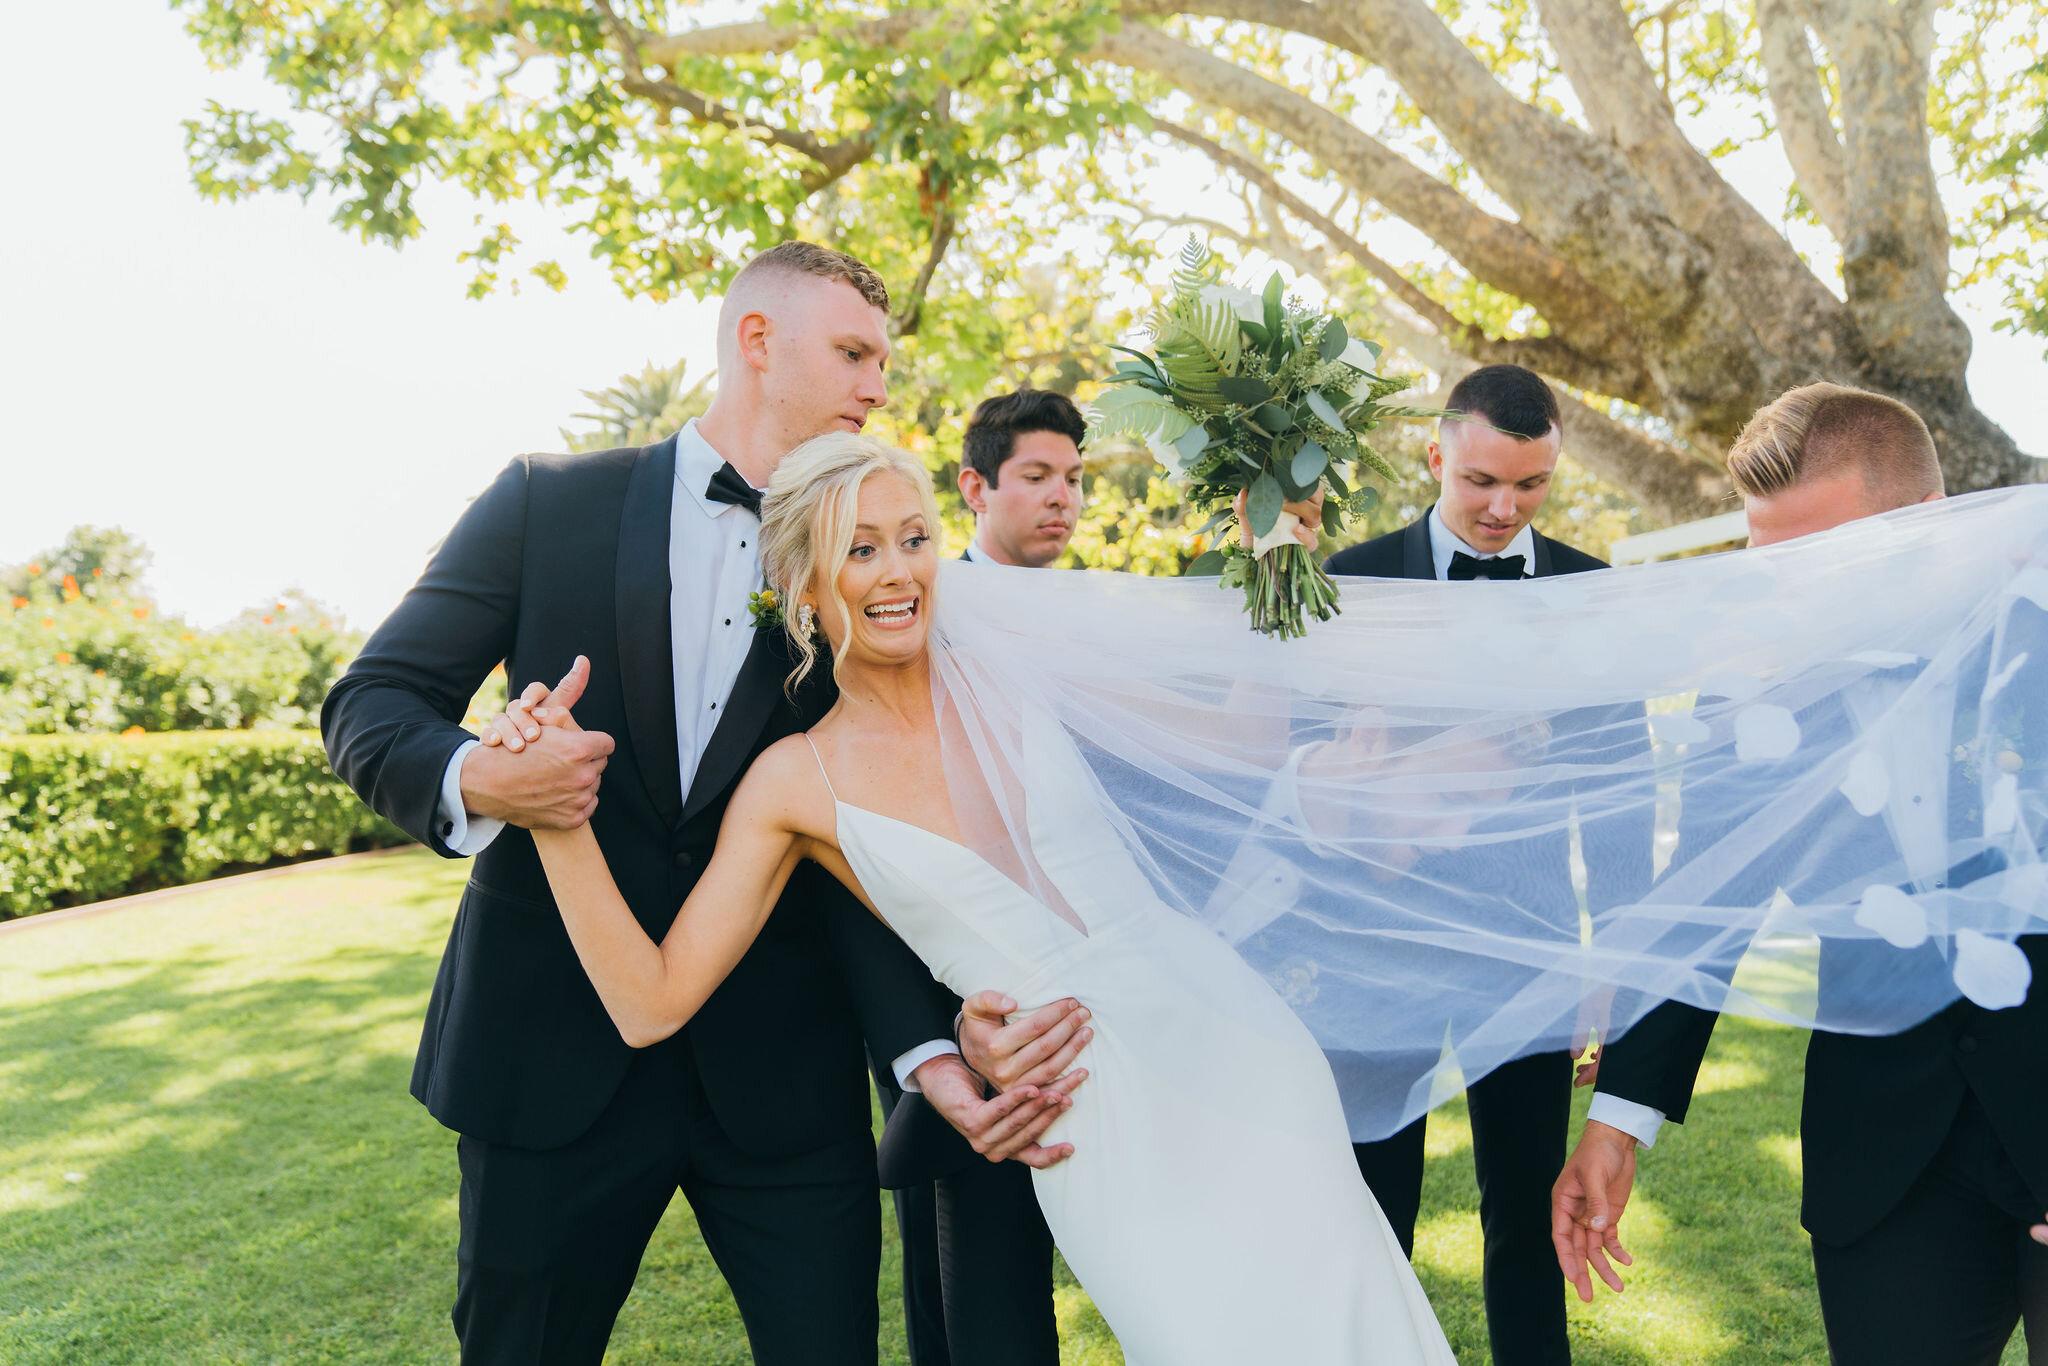 adamson-house-wedding-photography-089.jpg